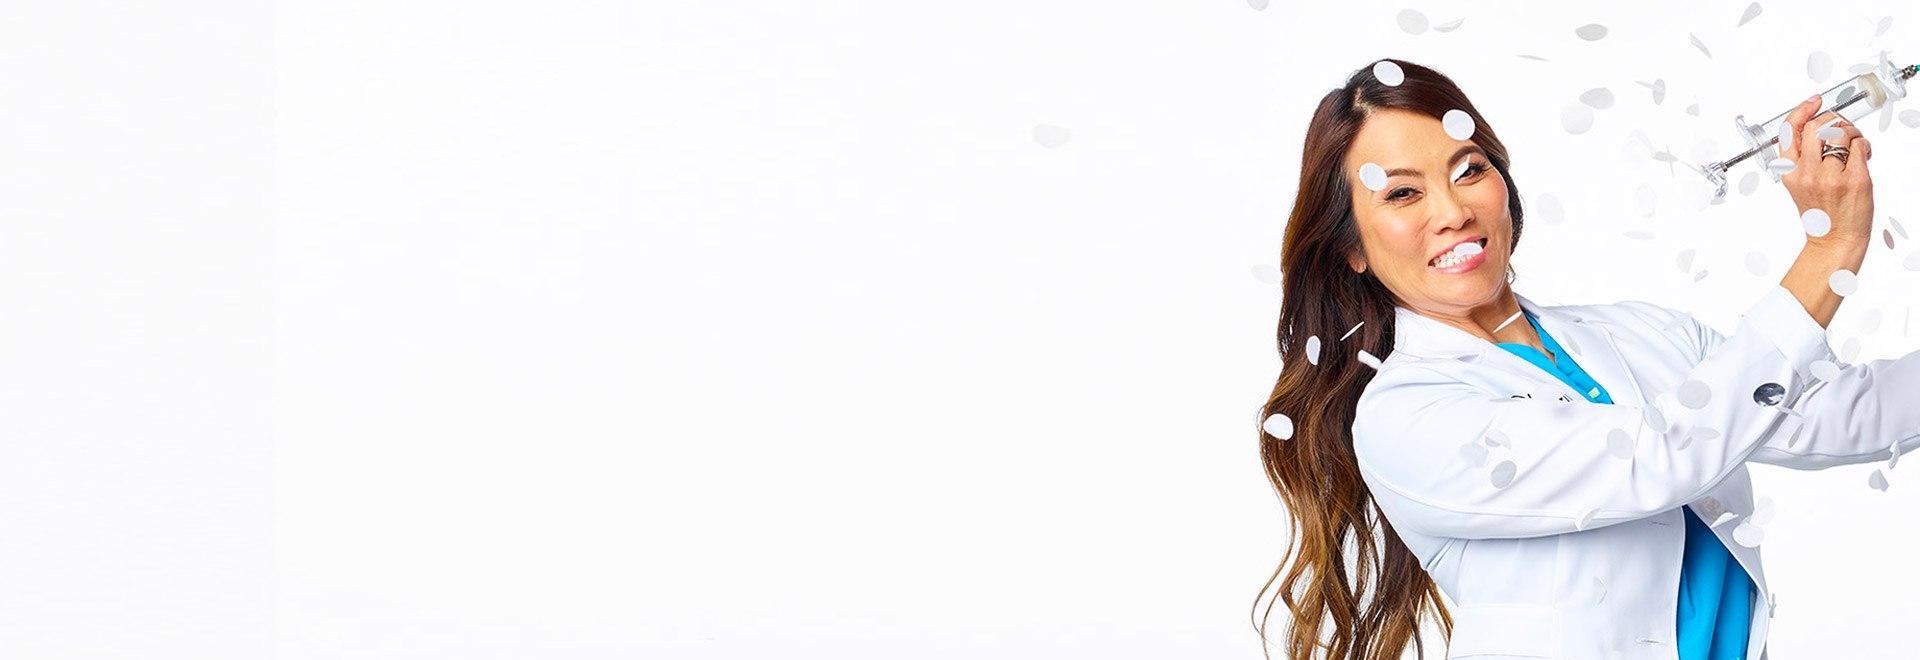 Dr. Pimple Popper: dr.ssa schiacciabrufoli - Prima visita